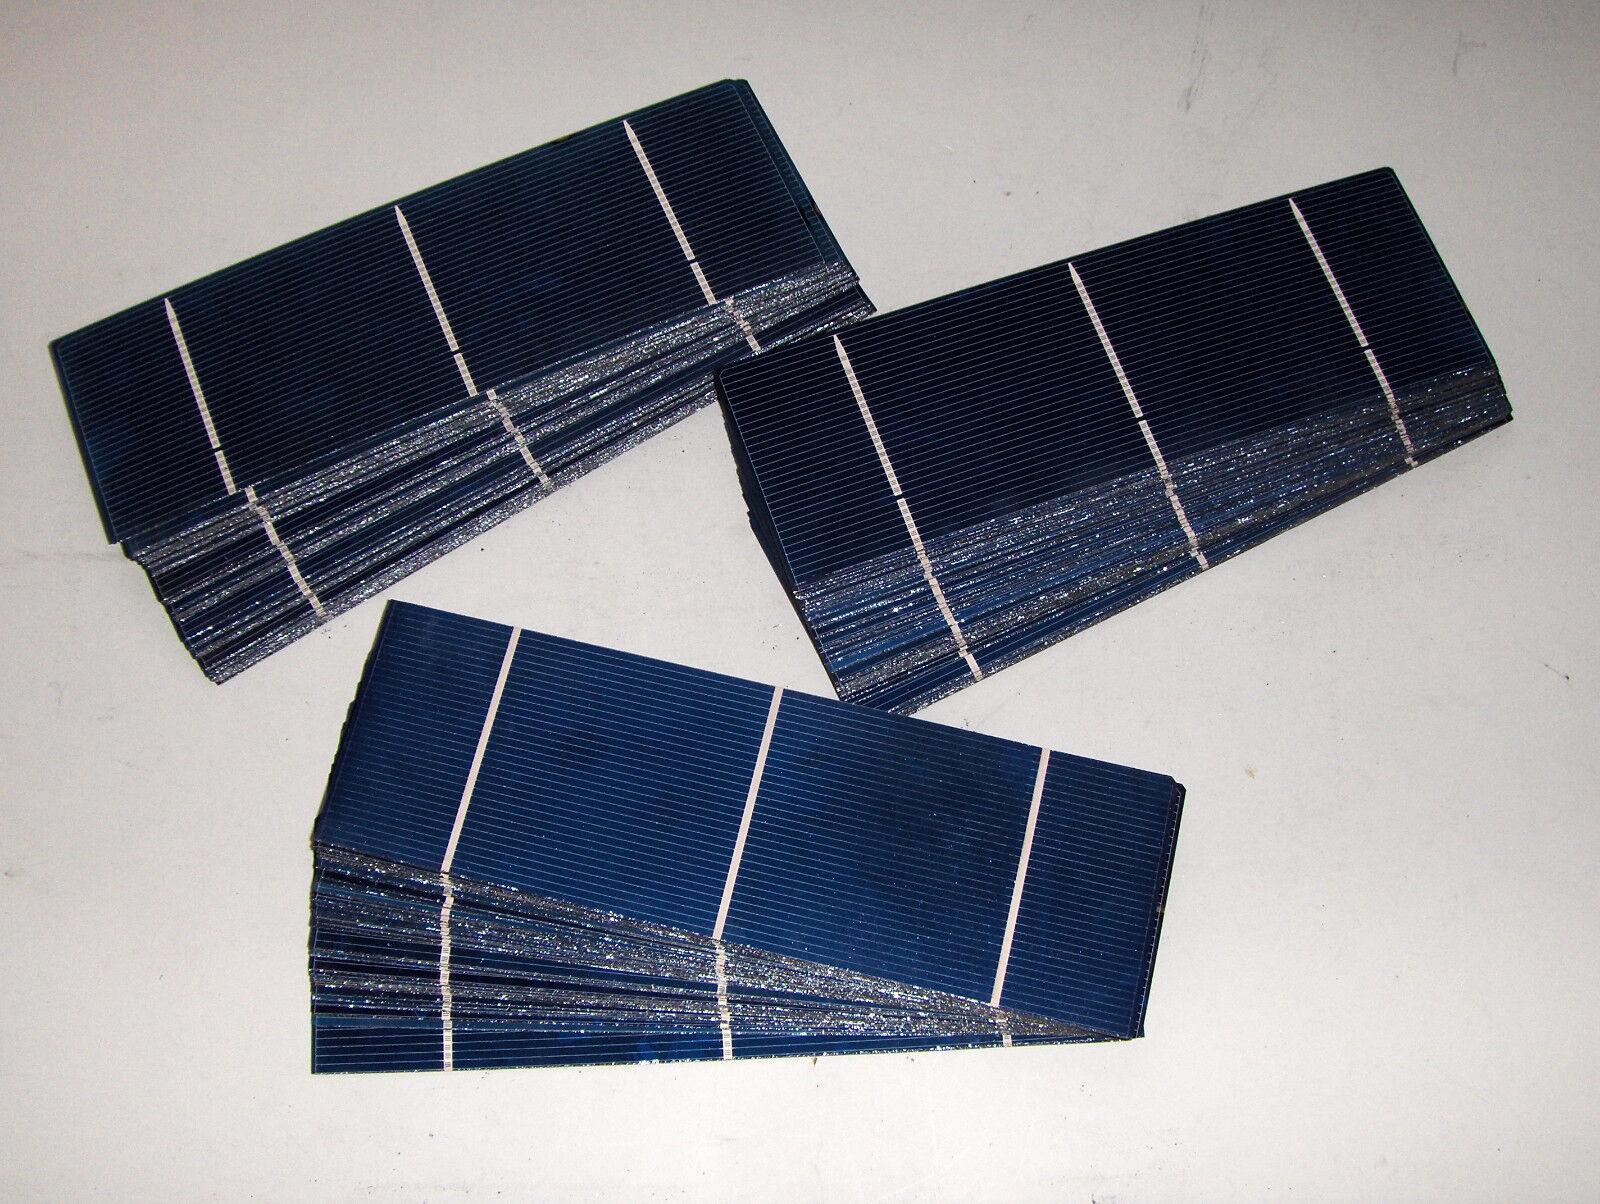 40-80-120 2x6 solar cells, .5v x 2.4 amp, 36 cells make a 44 wt panel,nice Größe